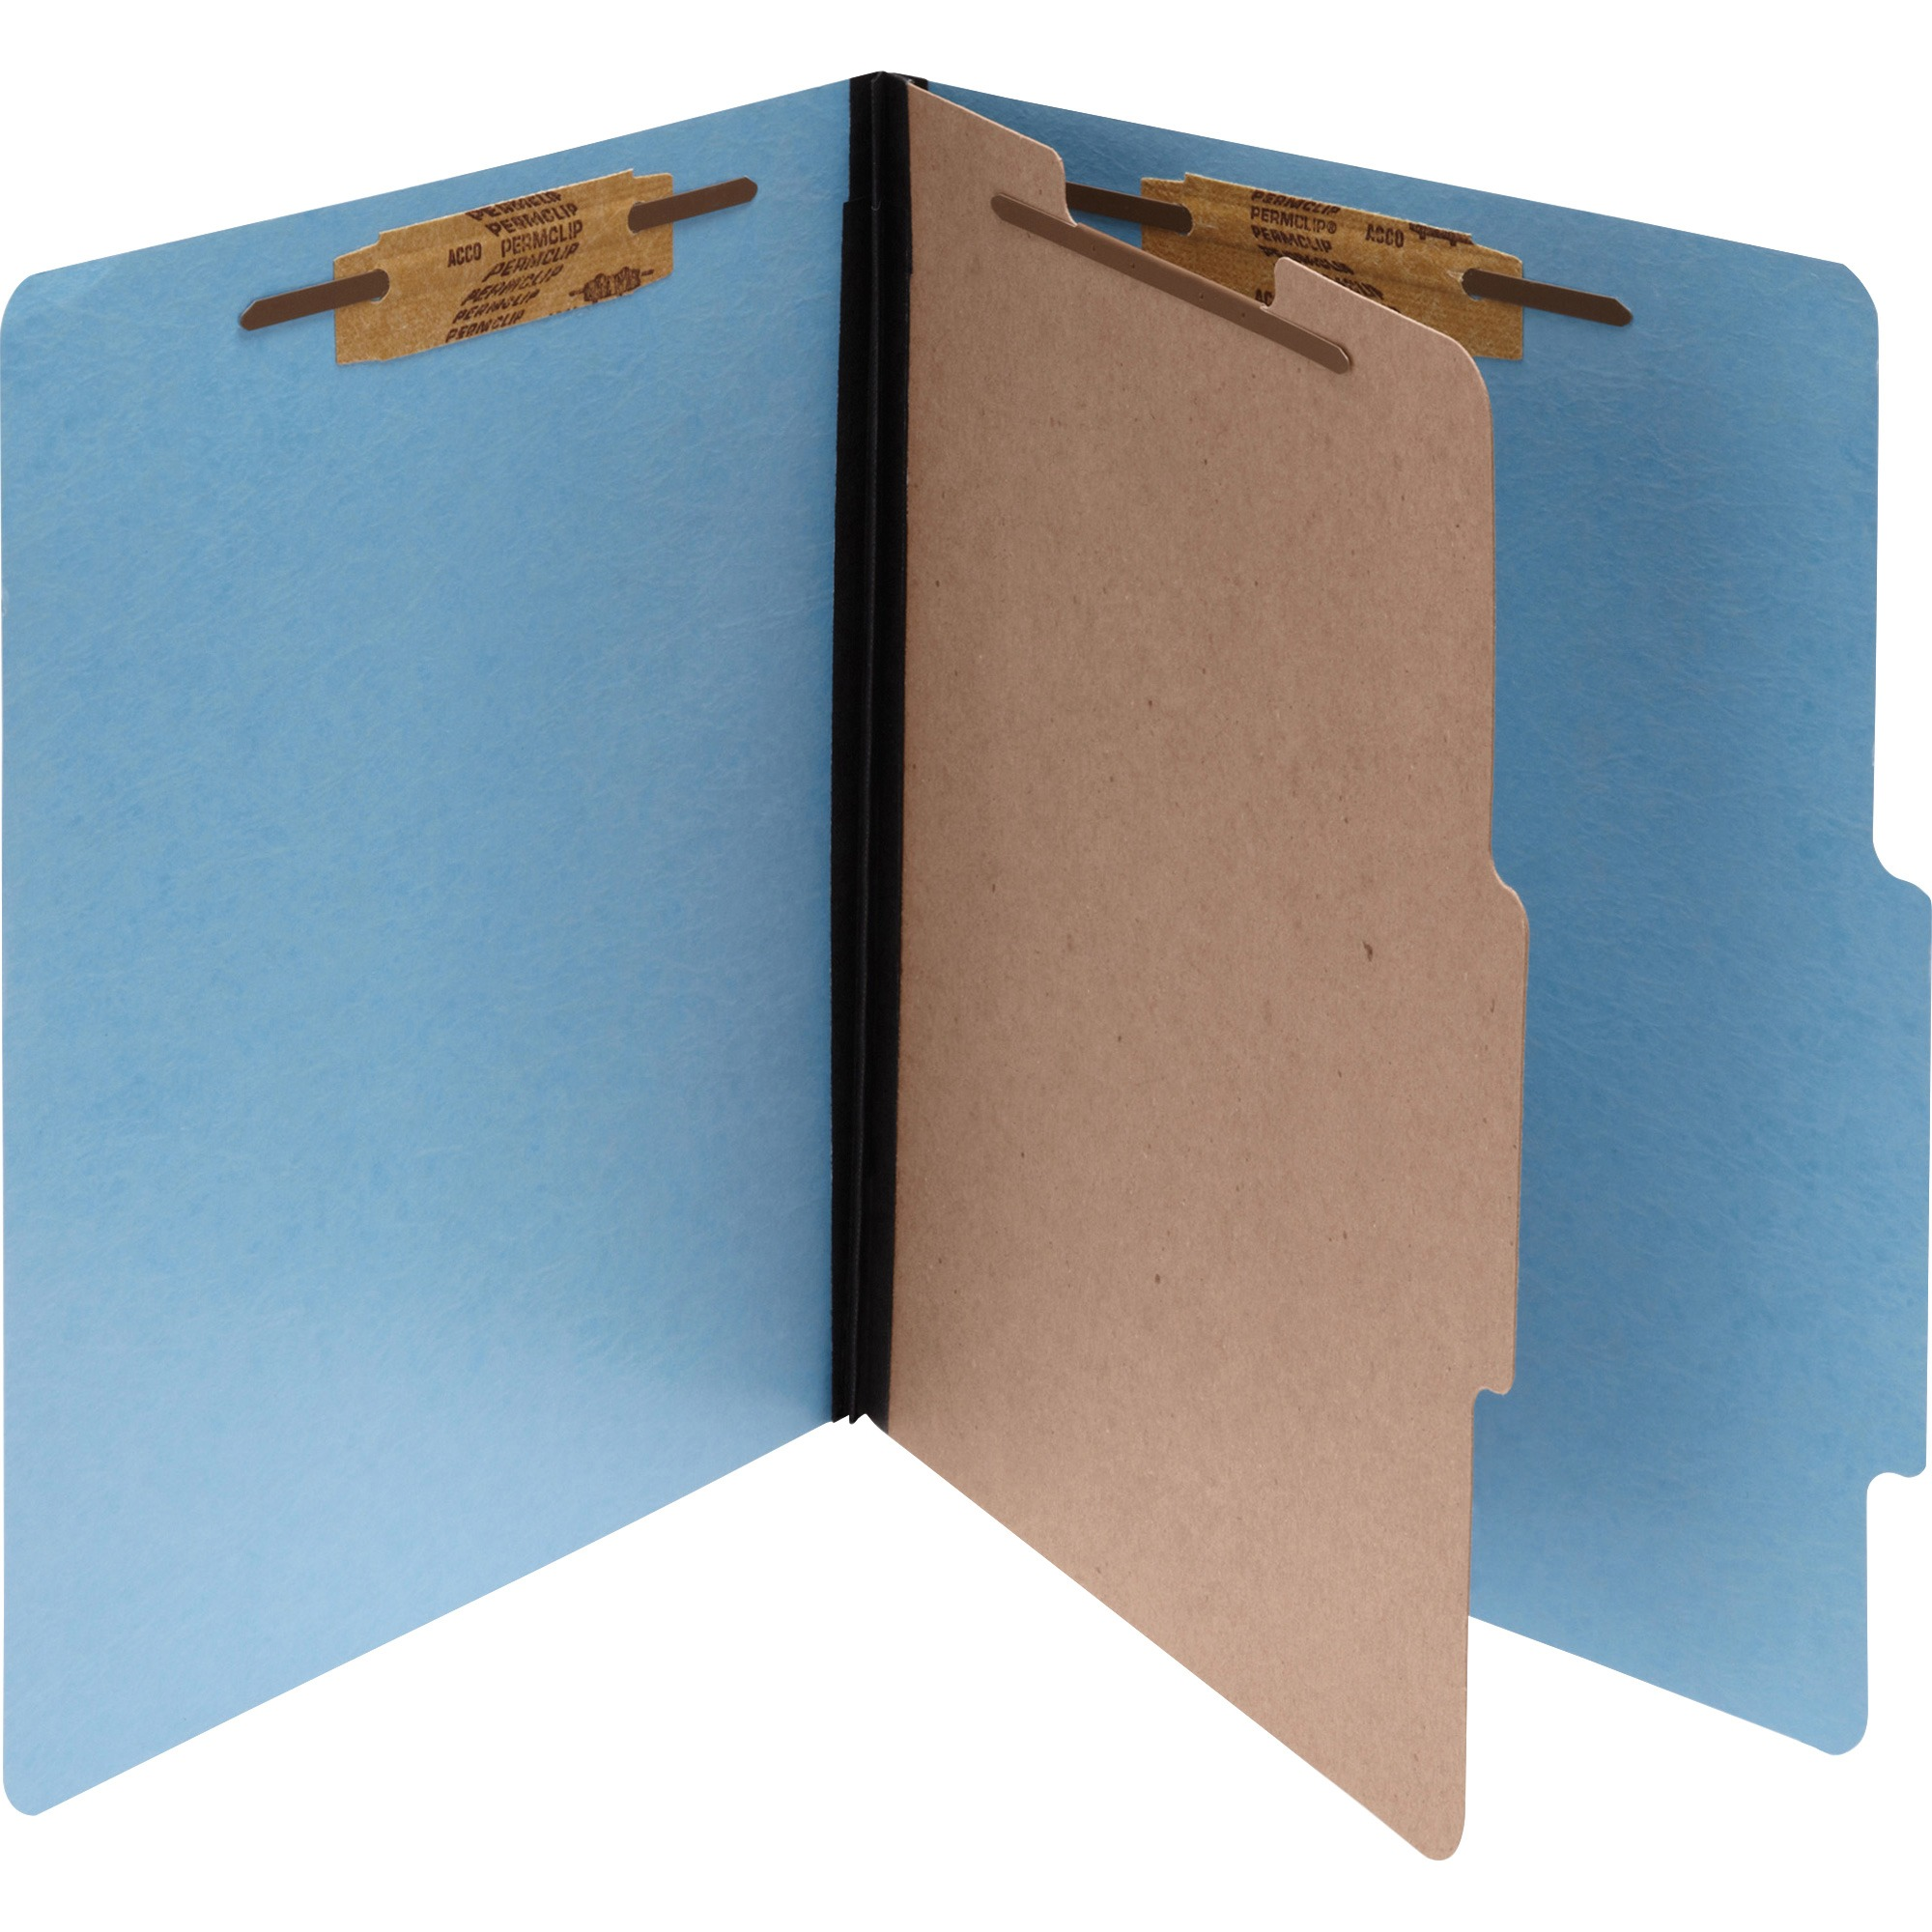 ColorLife PRESSTEX Classification Folders, Letter, 4-Section, Light Blue, 10/Box